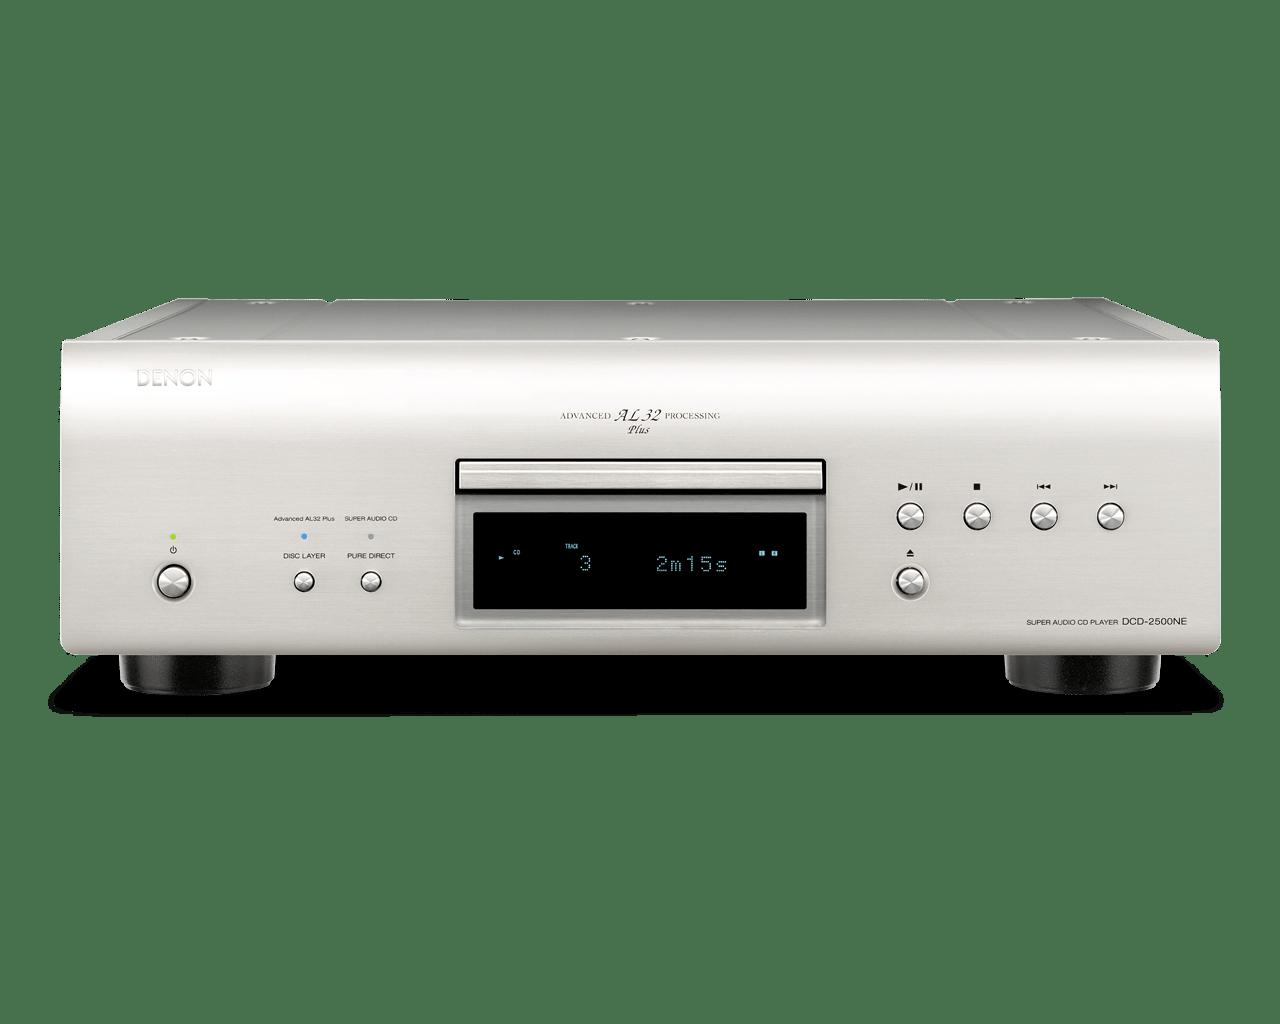 Denon DCD-2500NE front